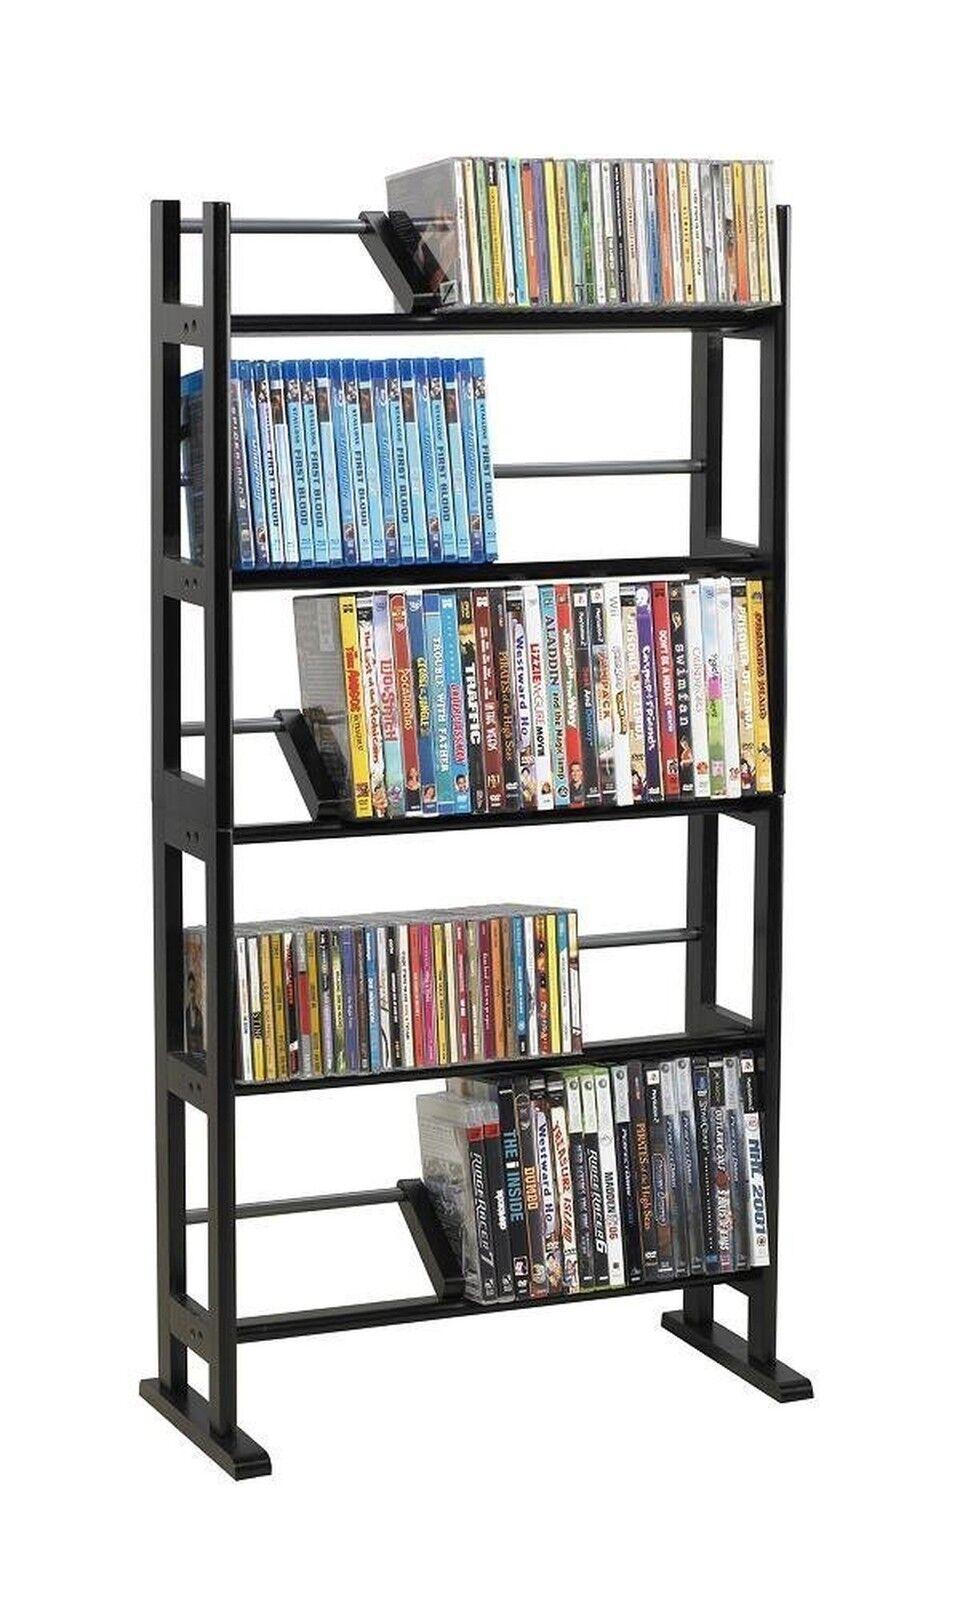 Atlantic Multimedia Rack DVD CD Storage Organizer Shelf Tower ...